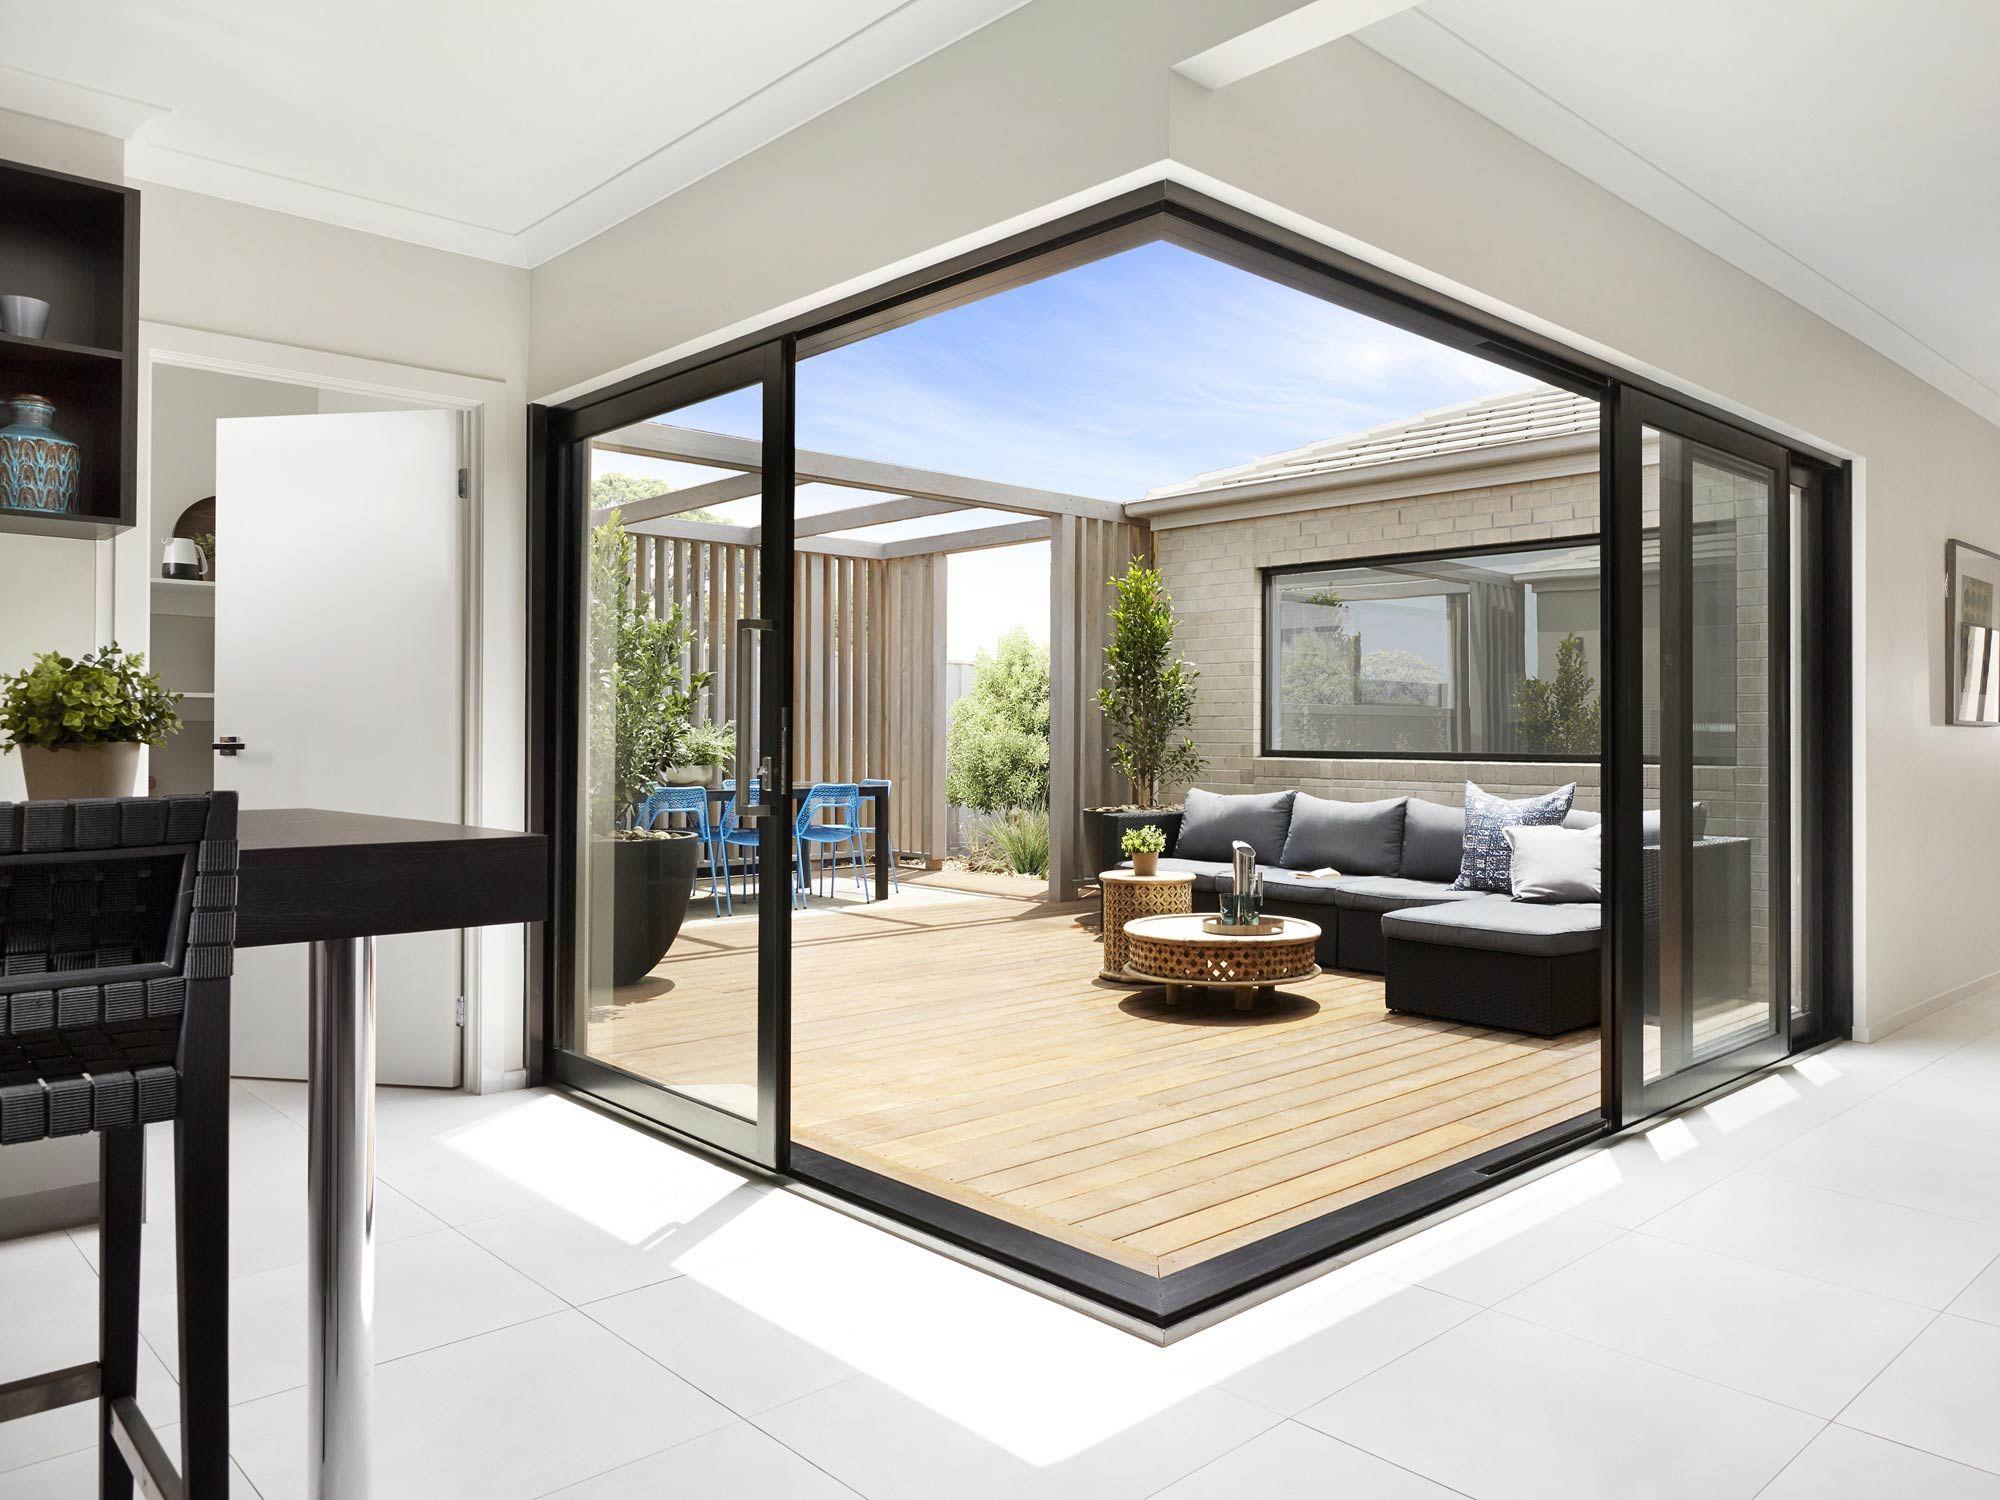 Many luxury custom homes have sliding glass doors p a r k many luxury custom homes have sliding glass doors rubansaba